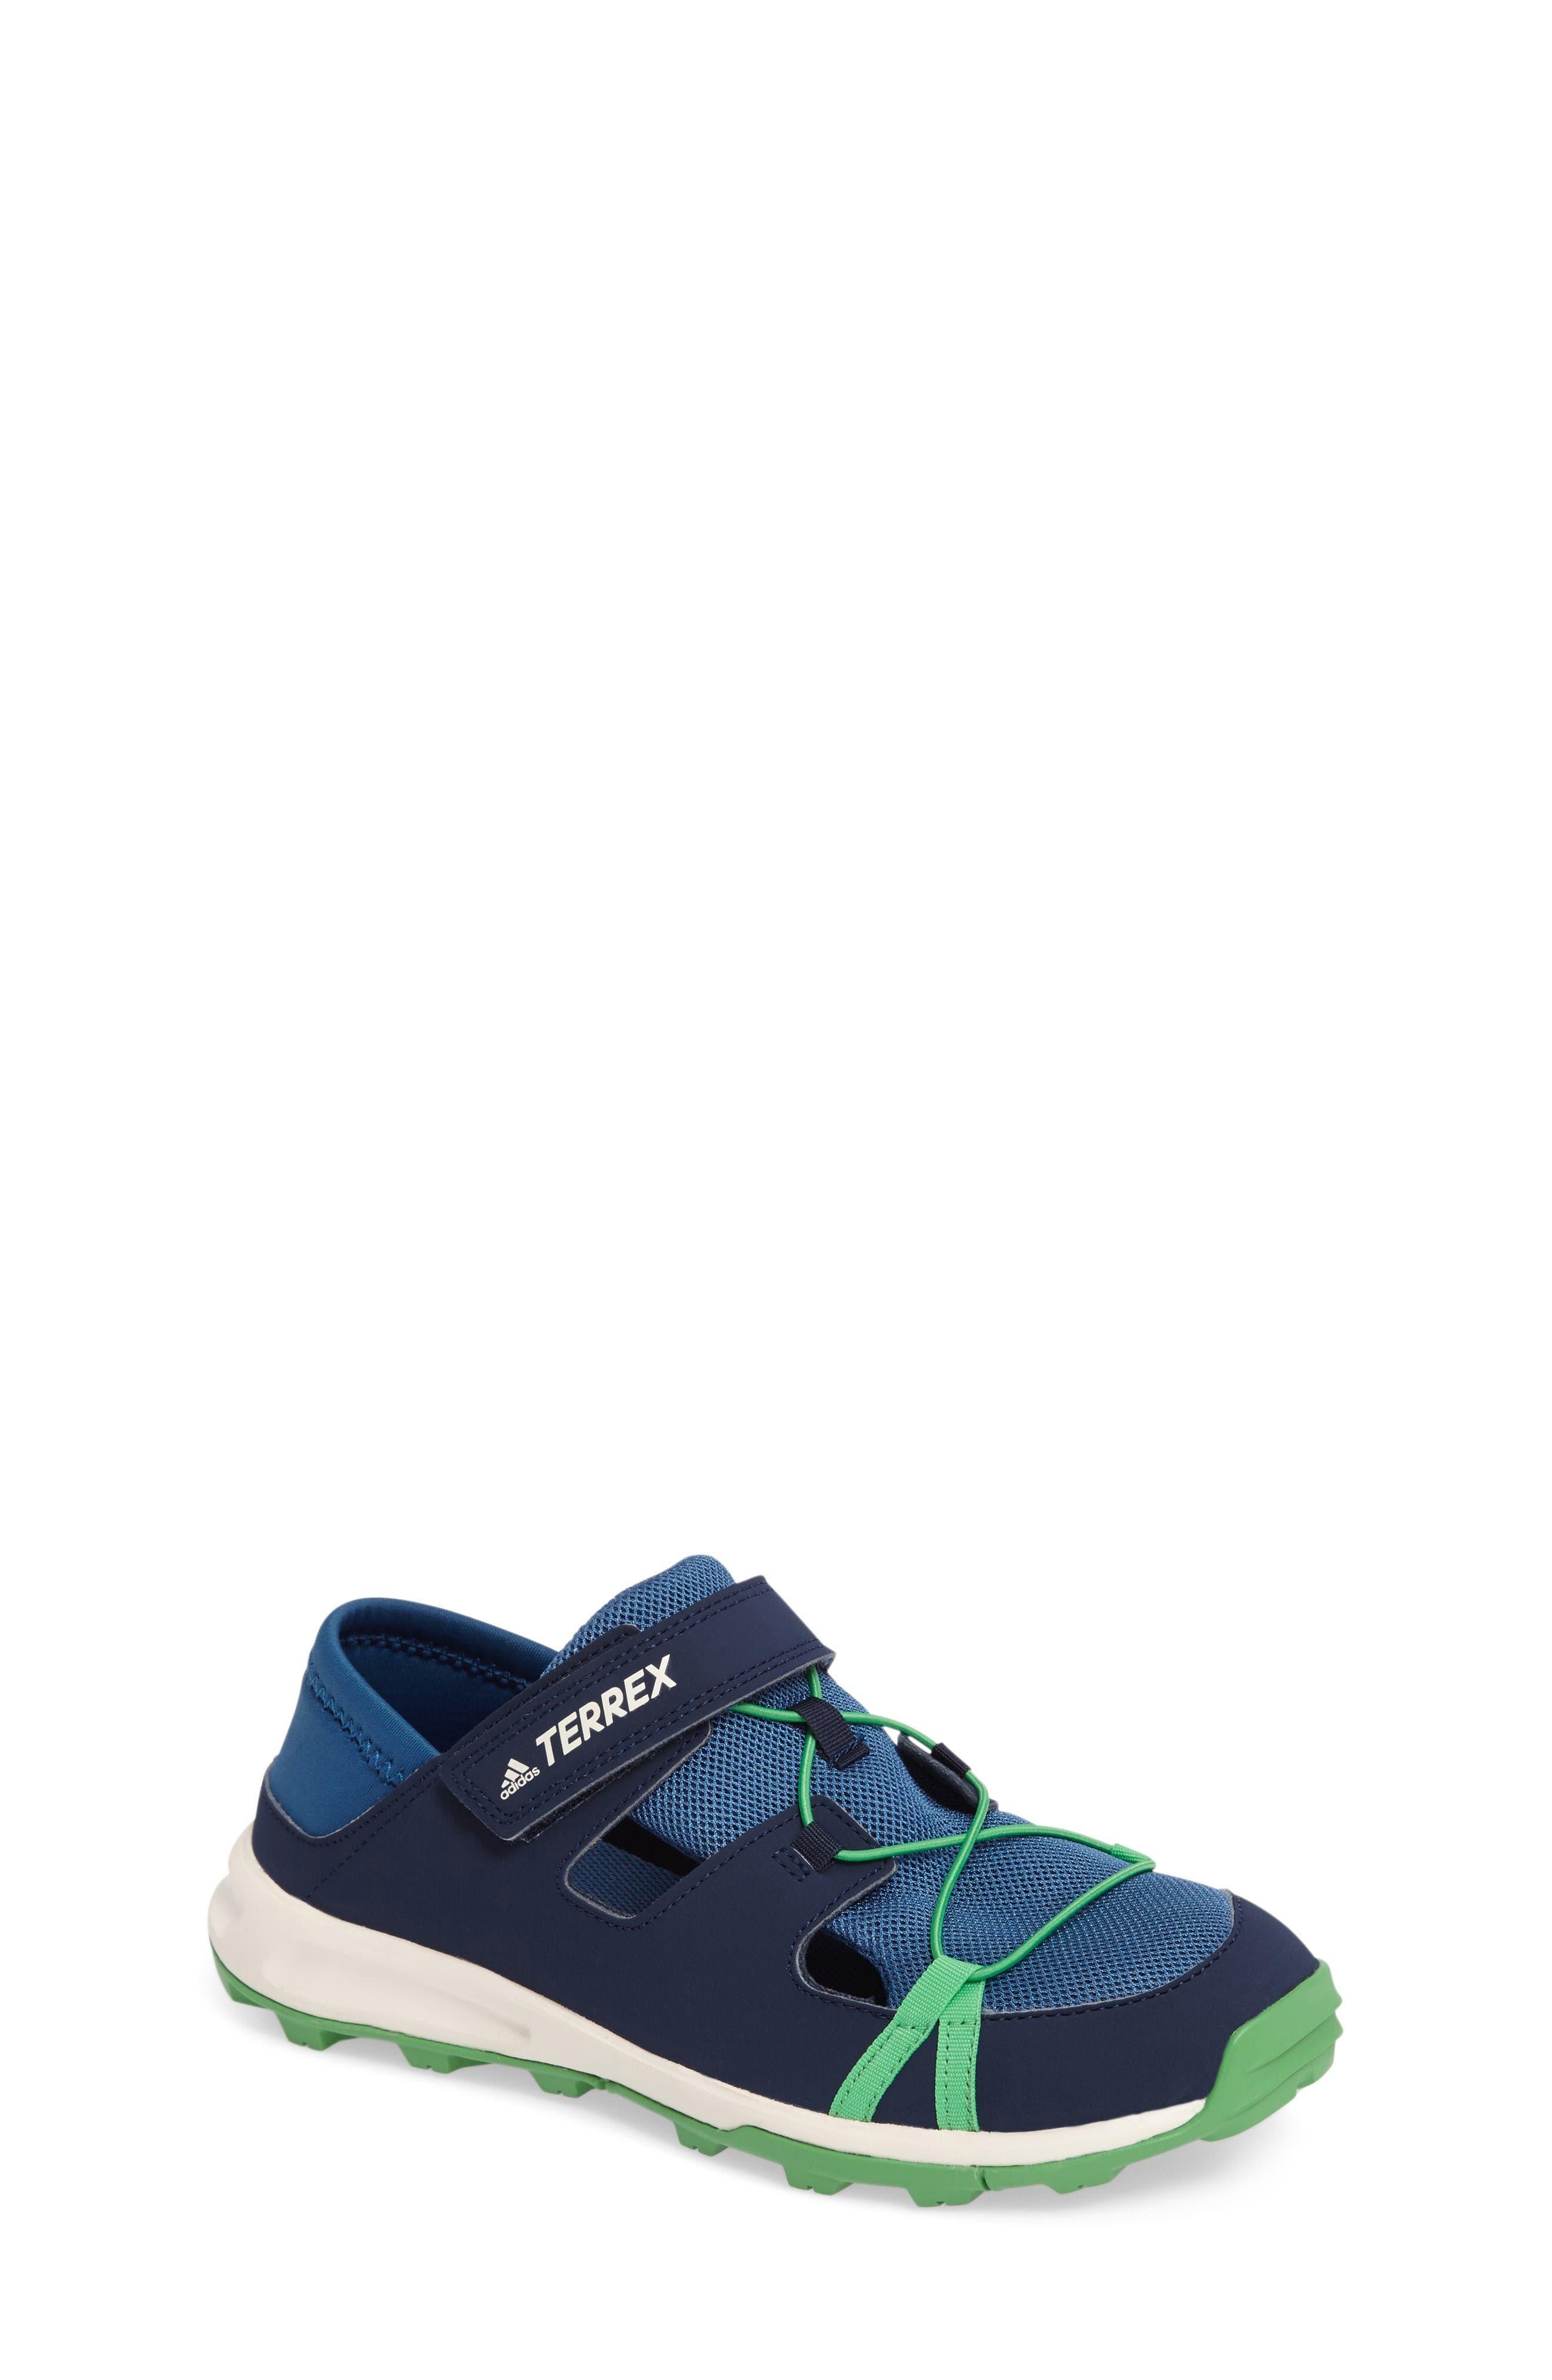 Alternate Image 1 Selected - adidas Terrex Tivid Sneaker (Toddler, Little Kid & Big Kid)